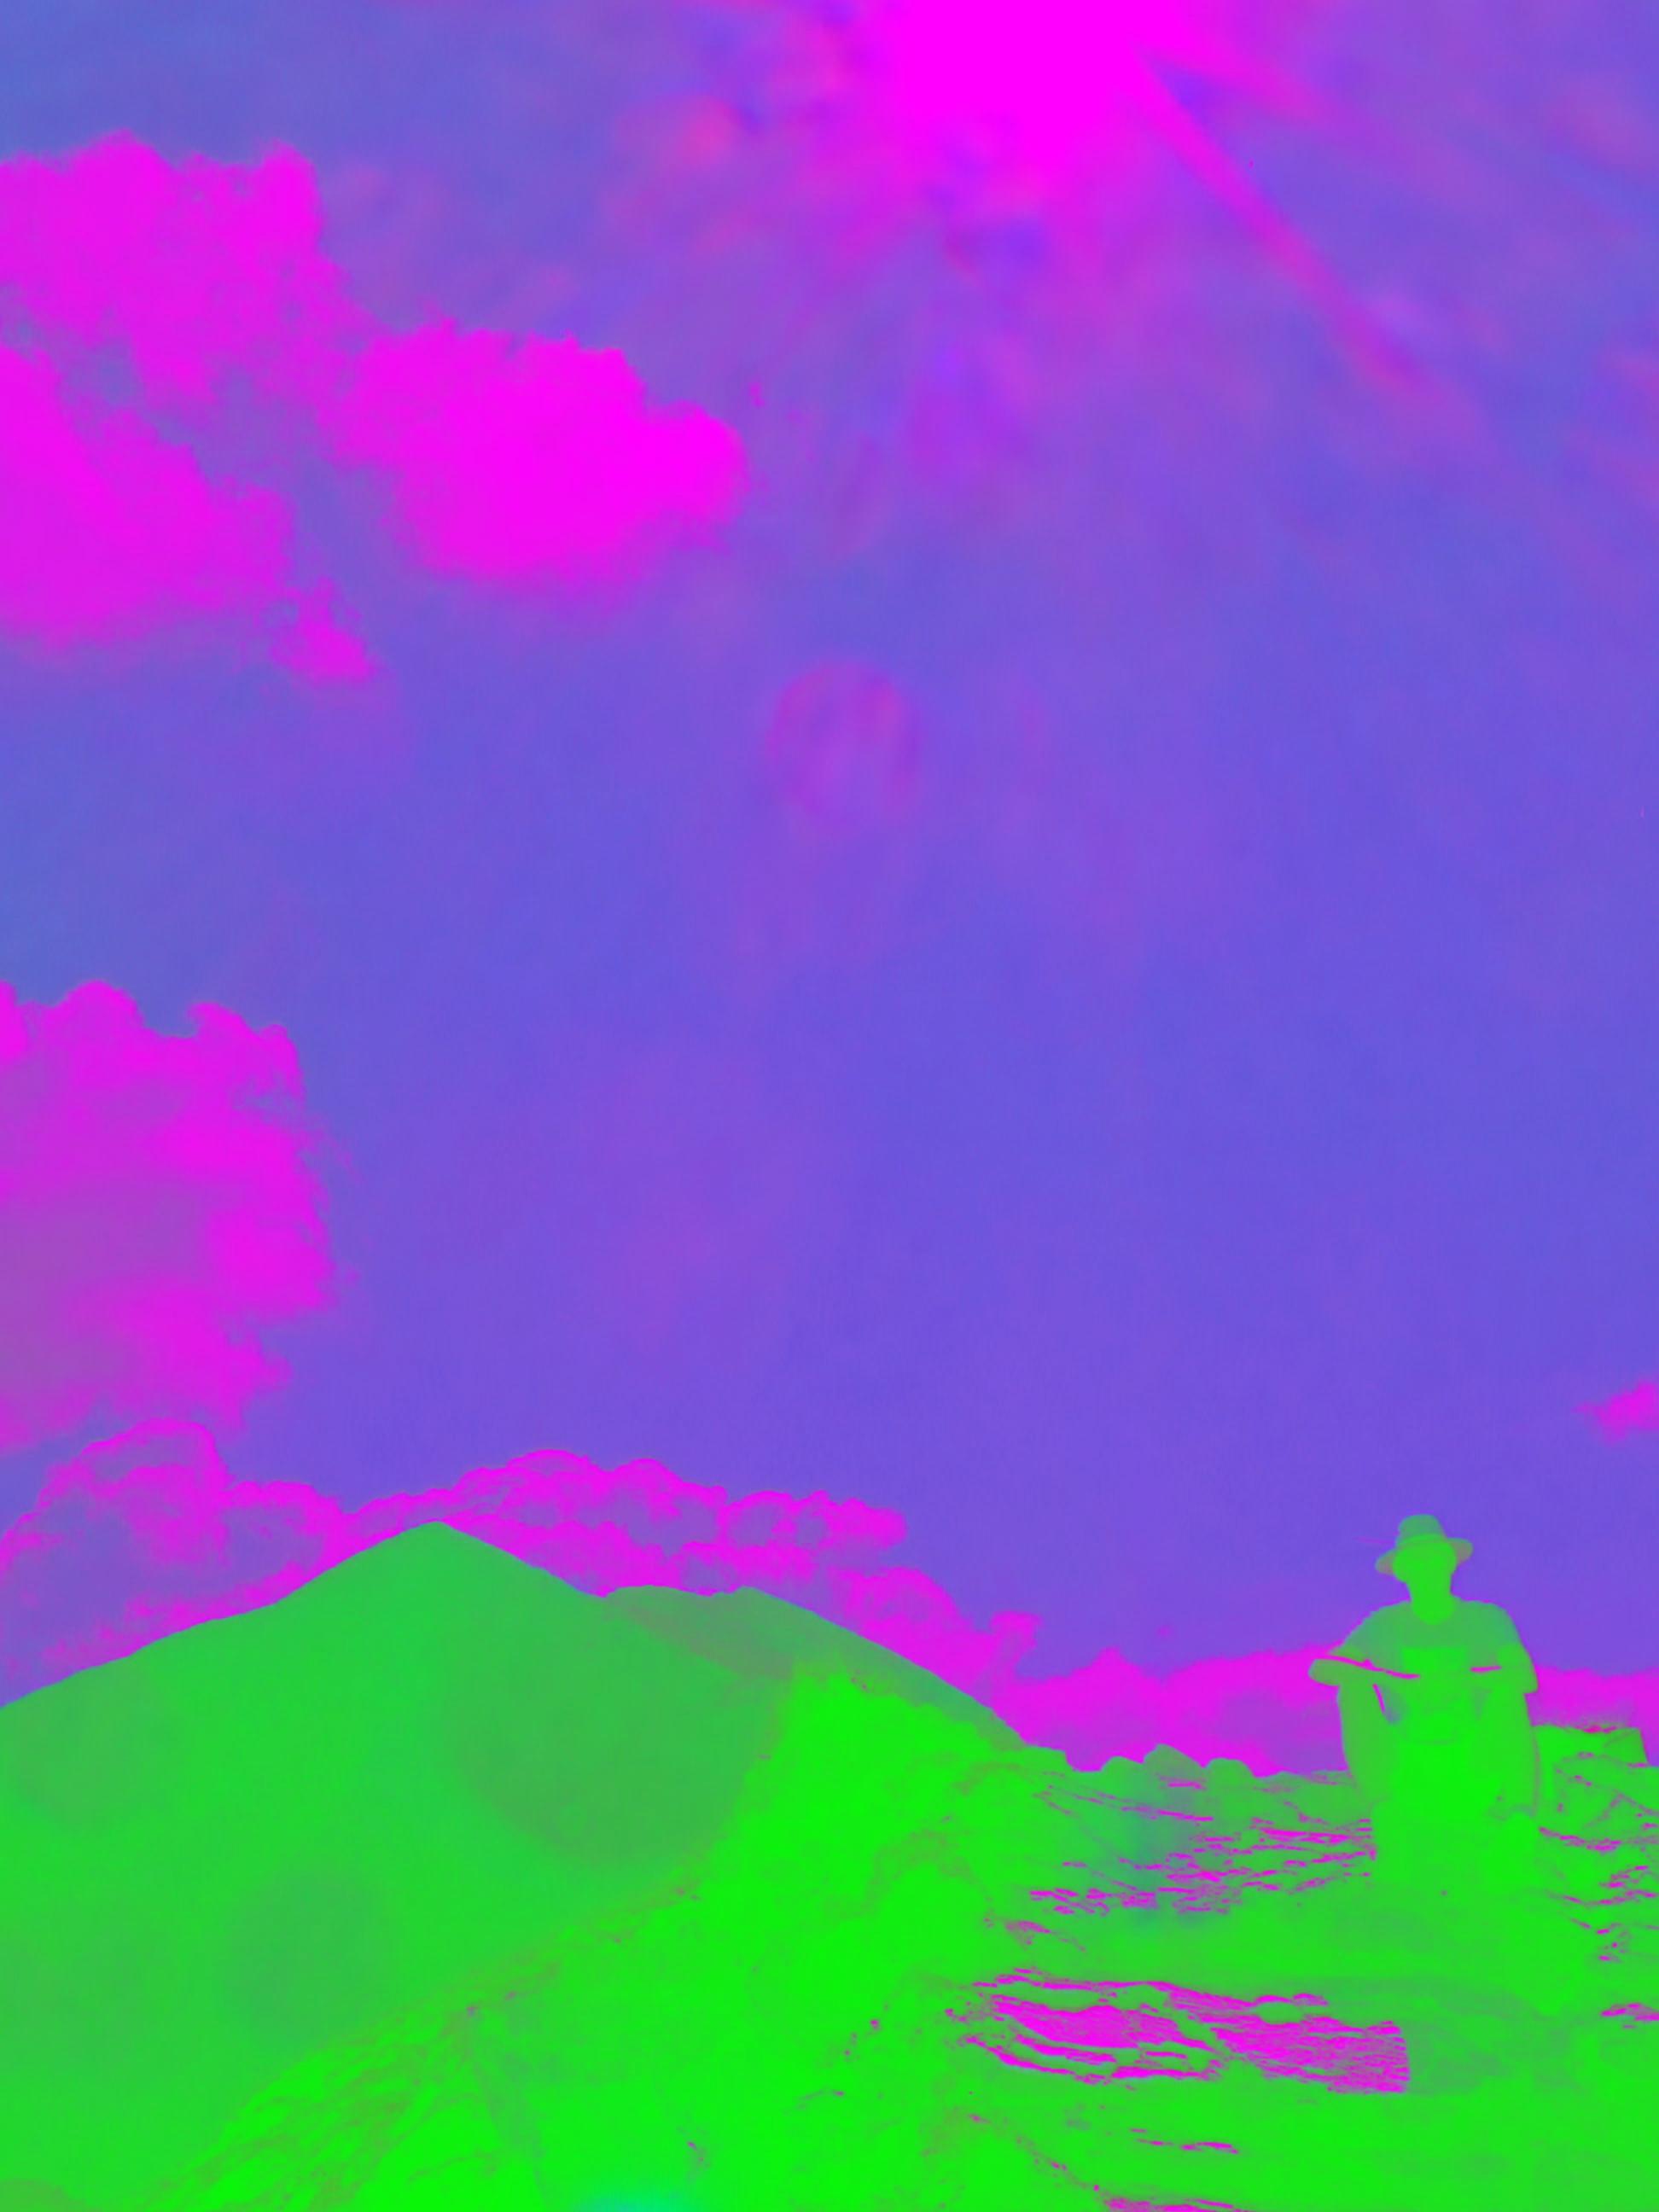 IMG_7714_negative=RB.JPG